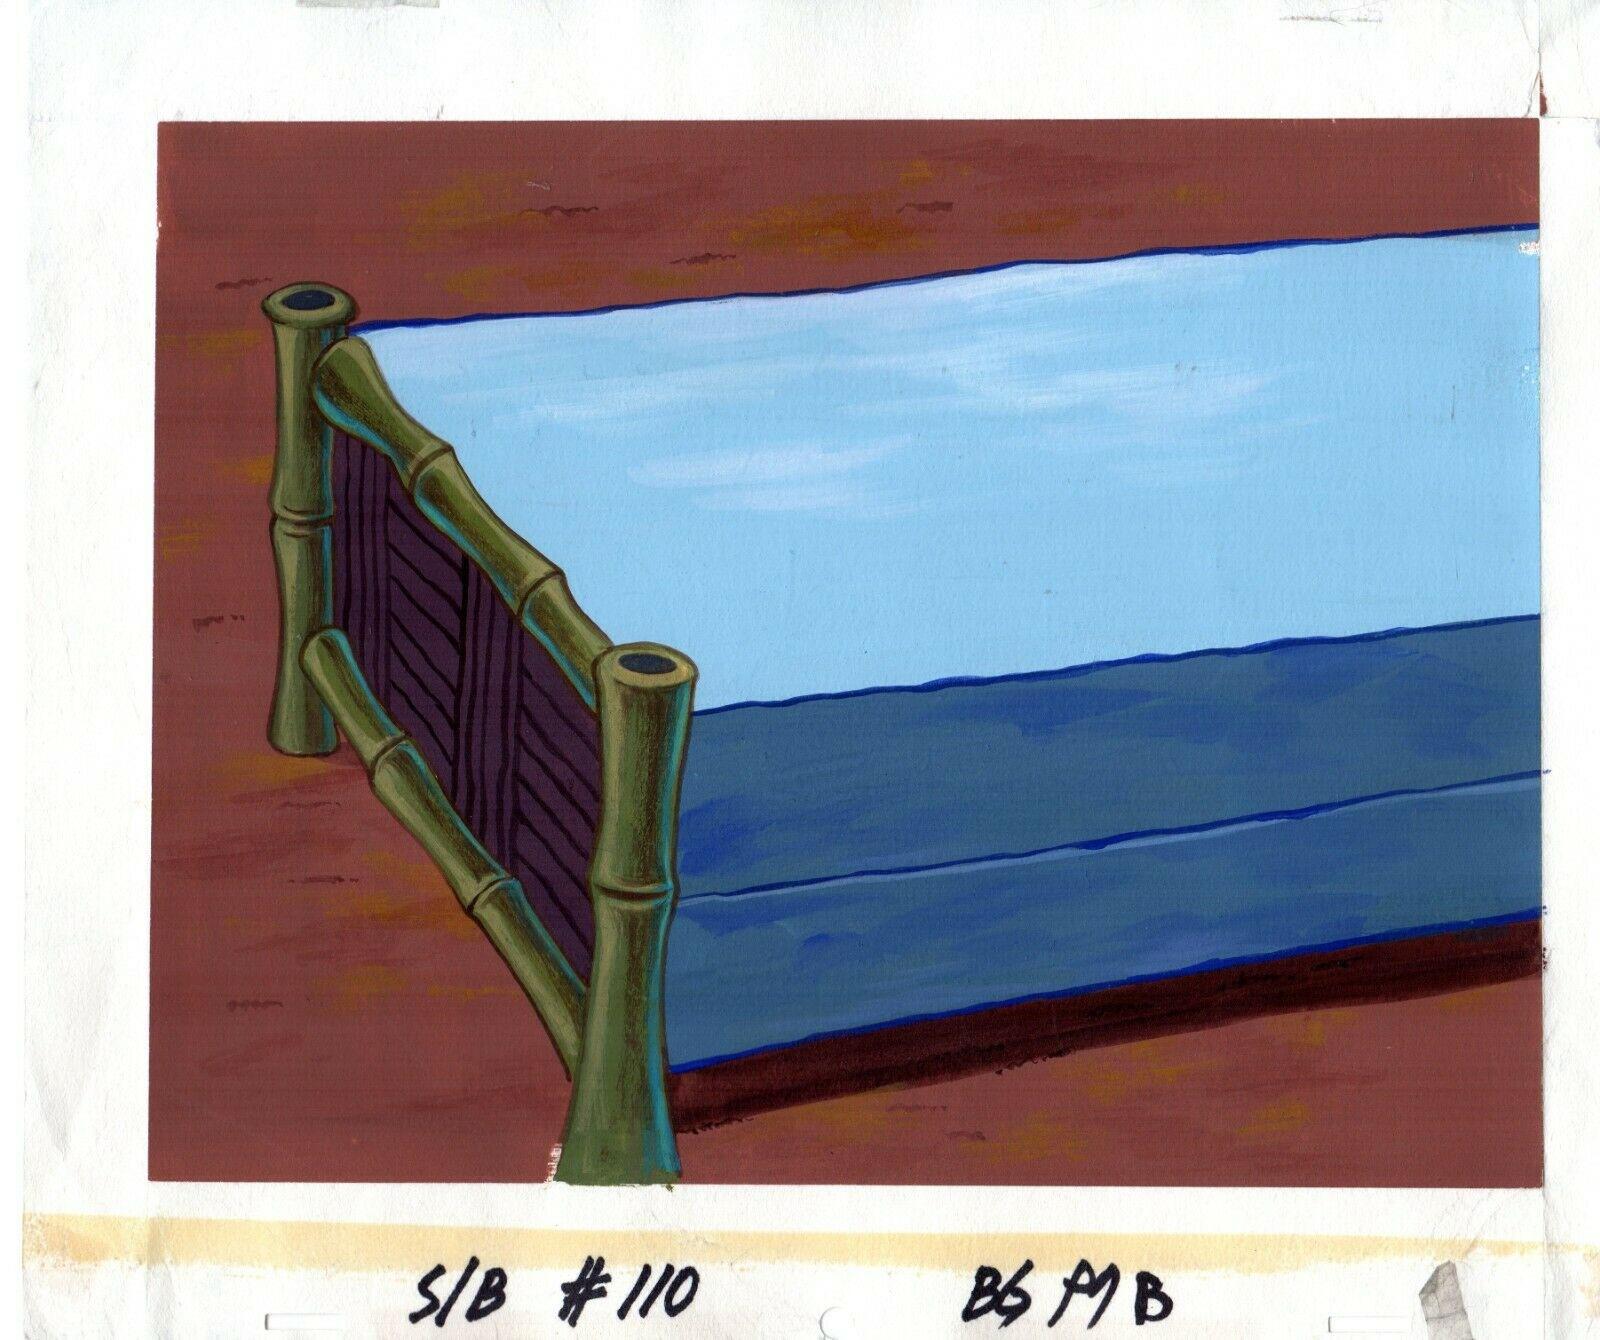 File:Image3.jpg